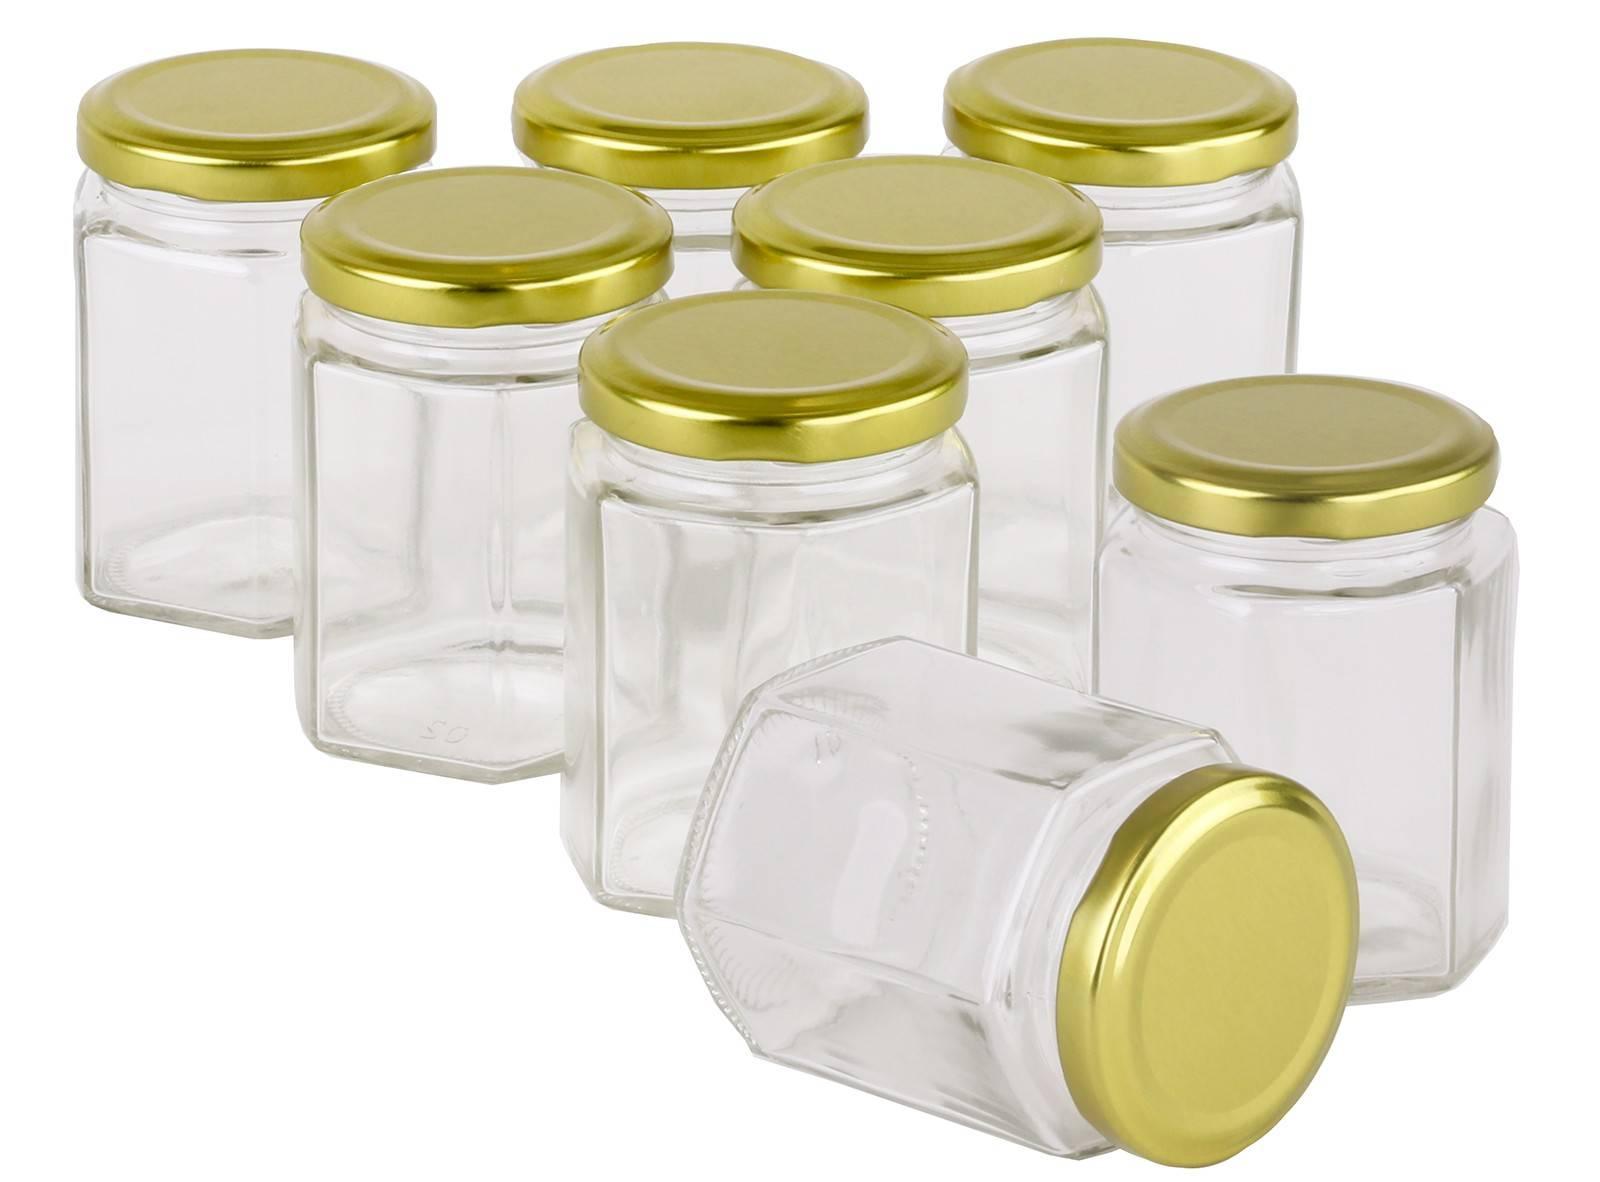 Carton 56 Pcs Honey Jars 250gm Size Hexagonal Glass